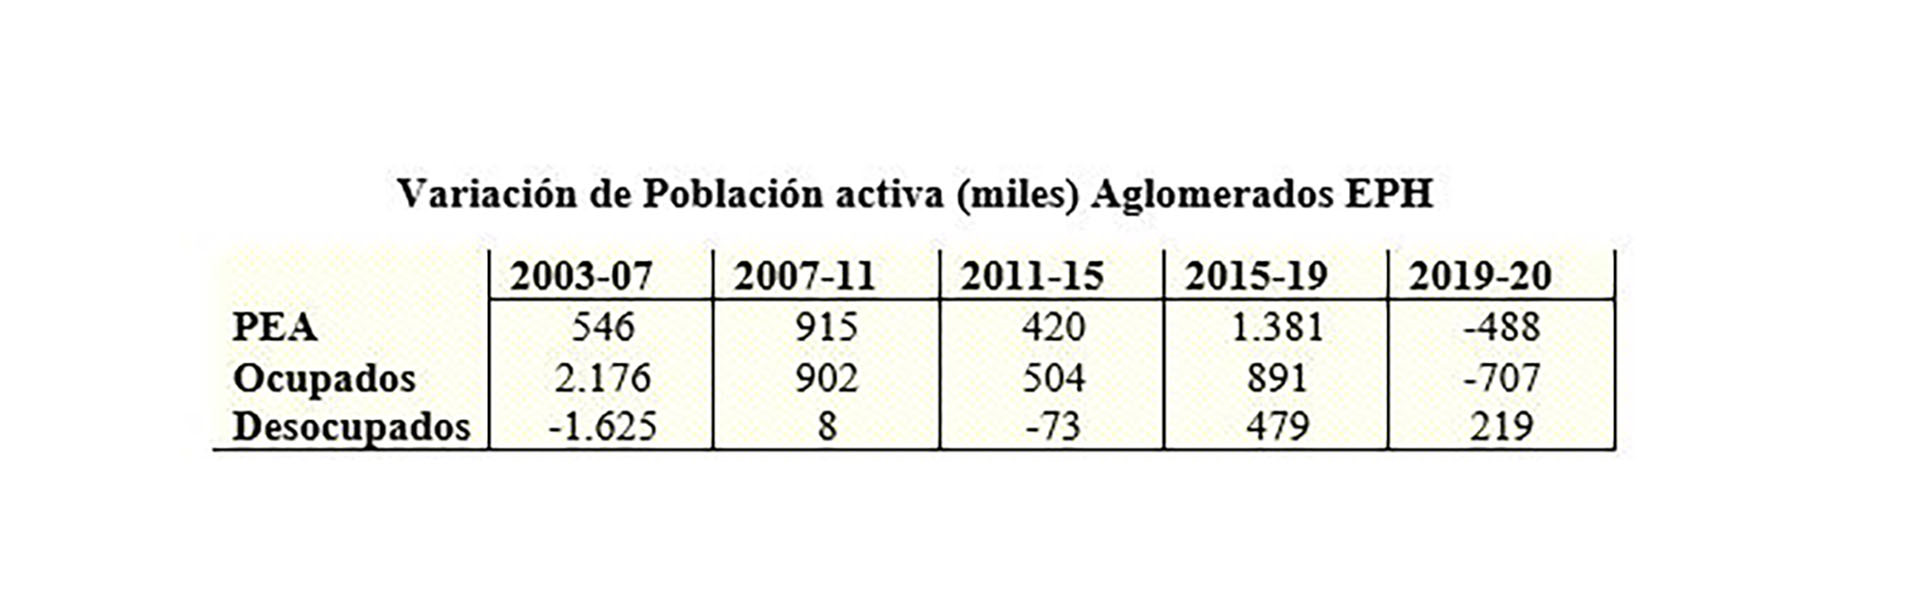 Fuente: Informes de prensa de la EPH. Notas: 2003: primer trimestre; 2015: tercer trimestre; resto: cuarto trimestre